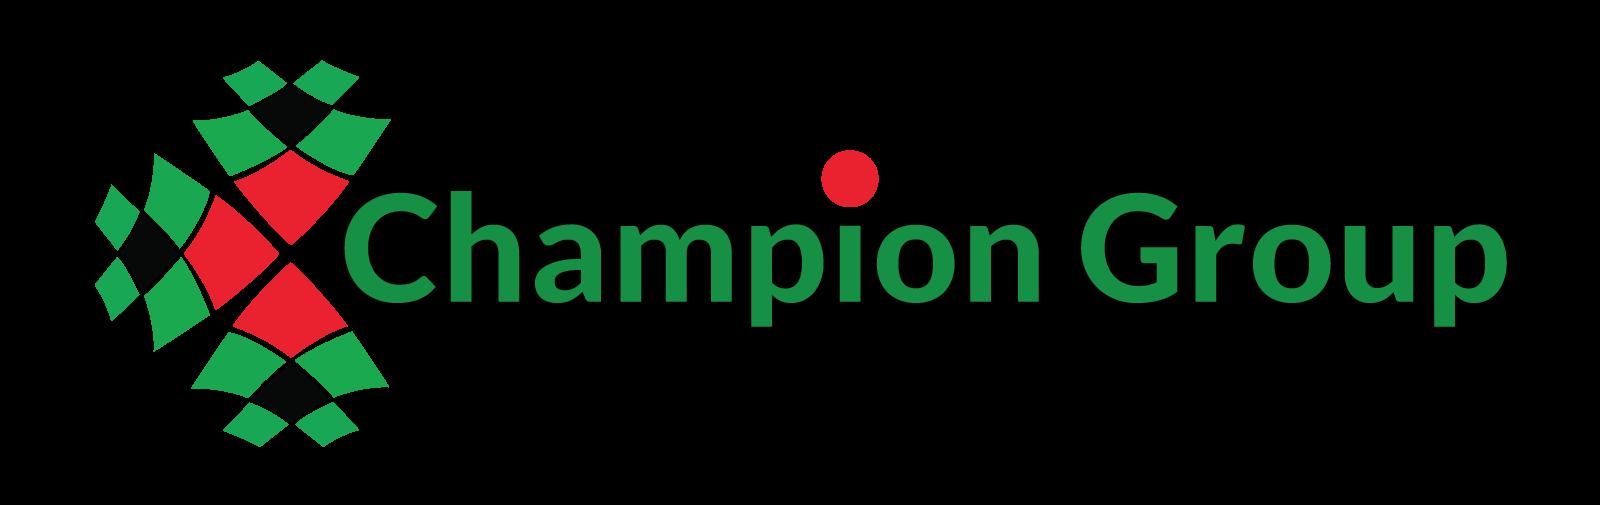 champion Group